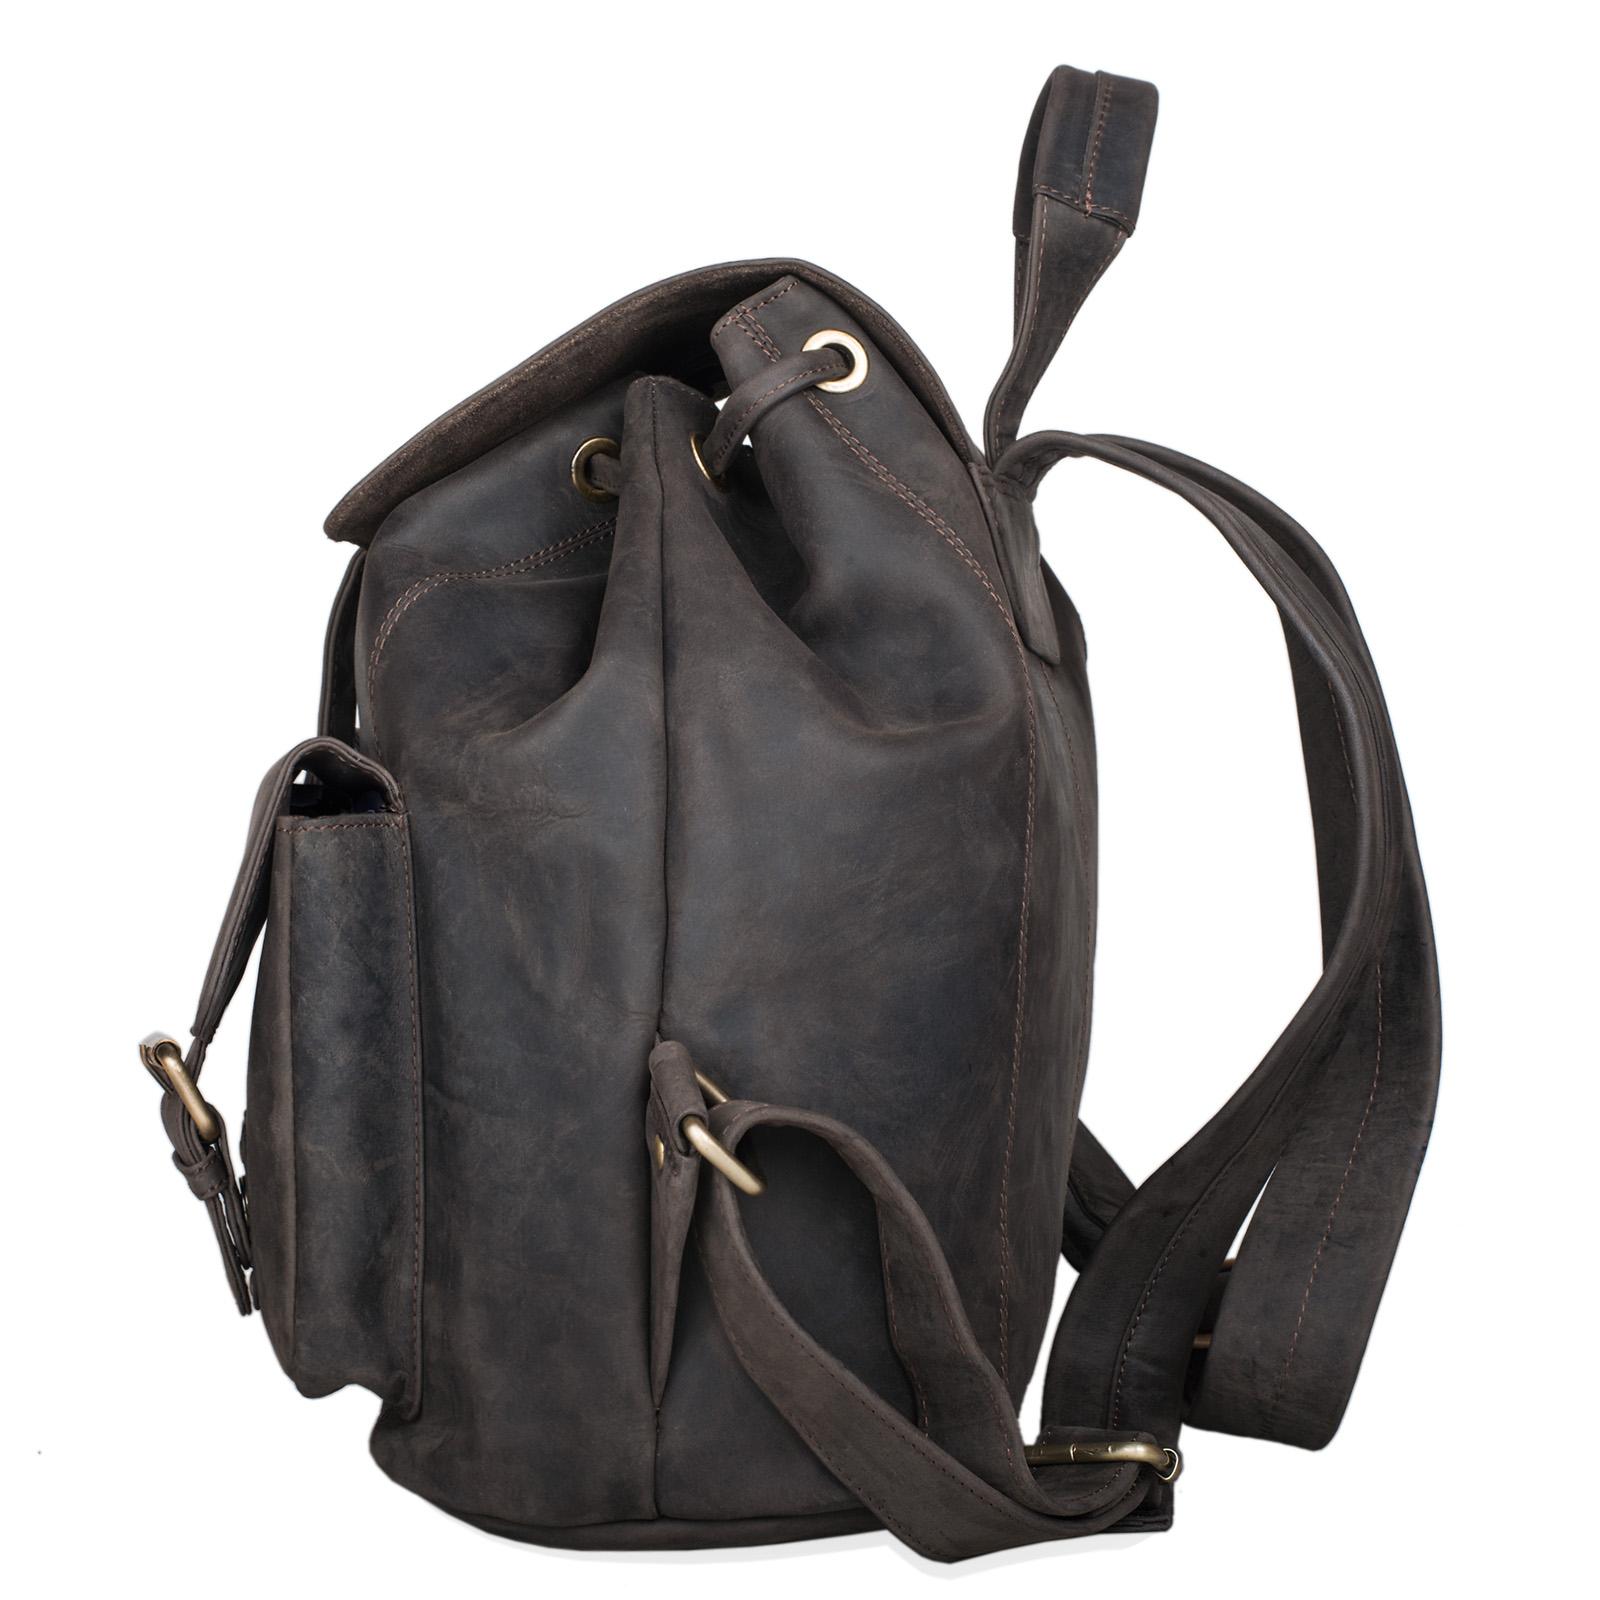 "STILORD ""Larissa"" Vintage Rucksack Leder Damen Rucksackhandtasche Lederrucksack Handtasche DIN A4 City Shopping Daypack Schule Uni - Bild 16"